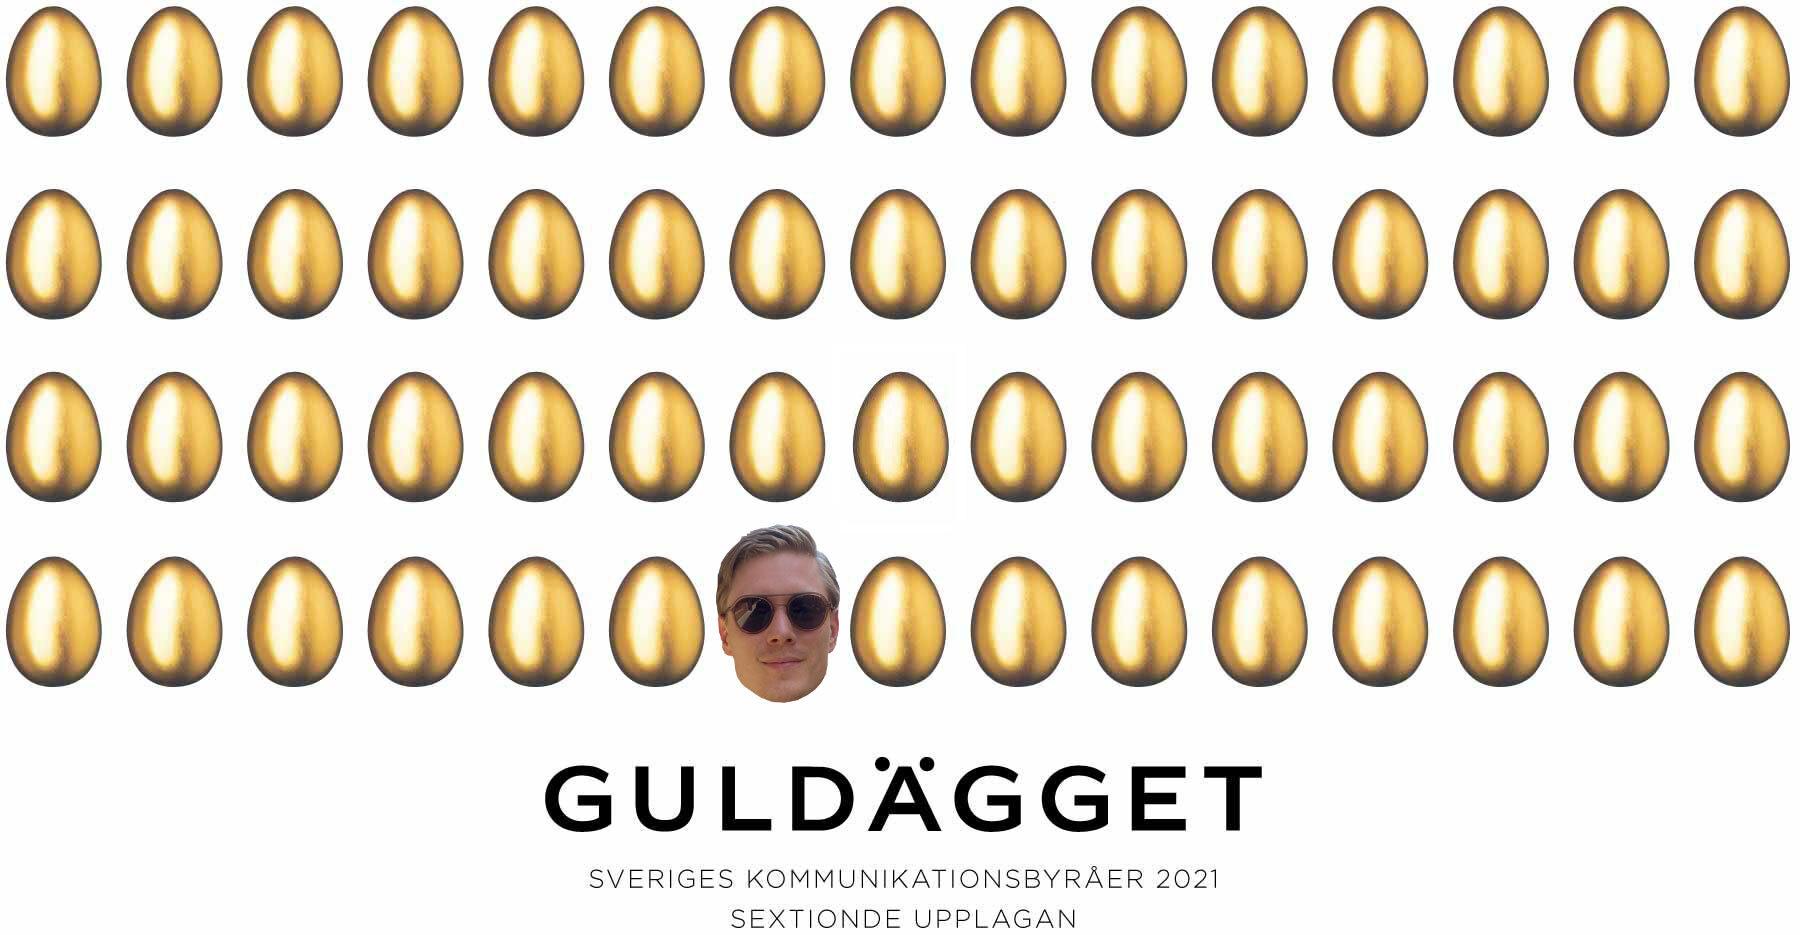 Guldägget partnership Adam Gäfvert